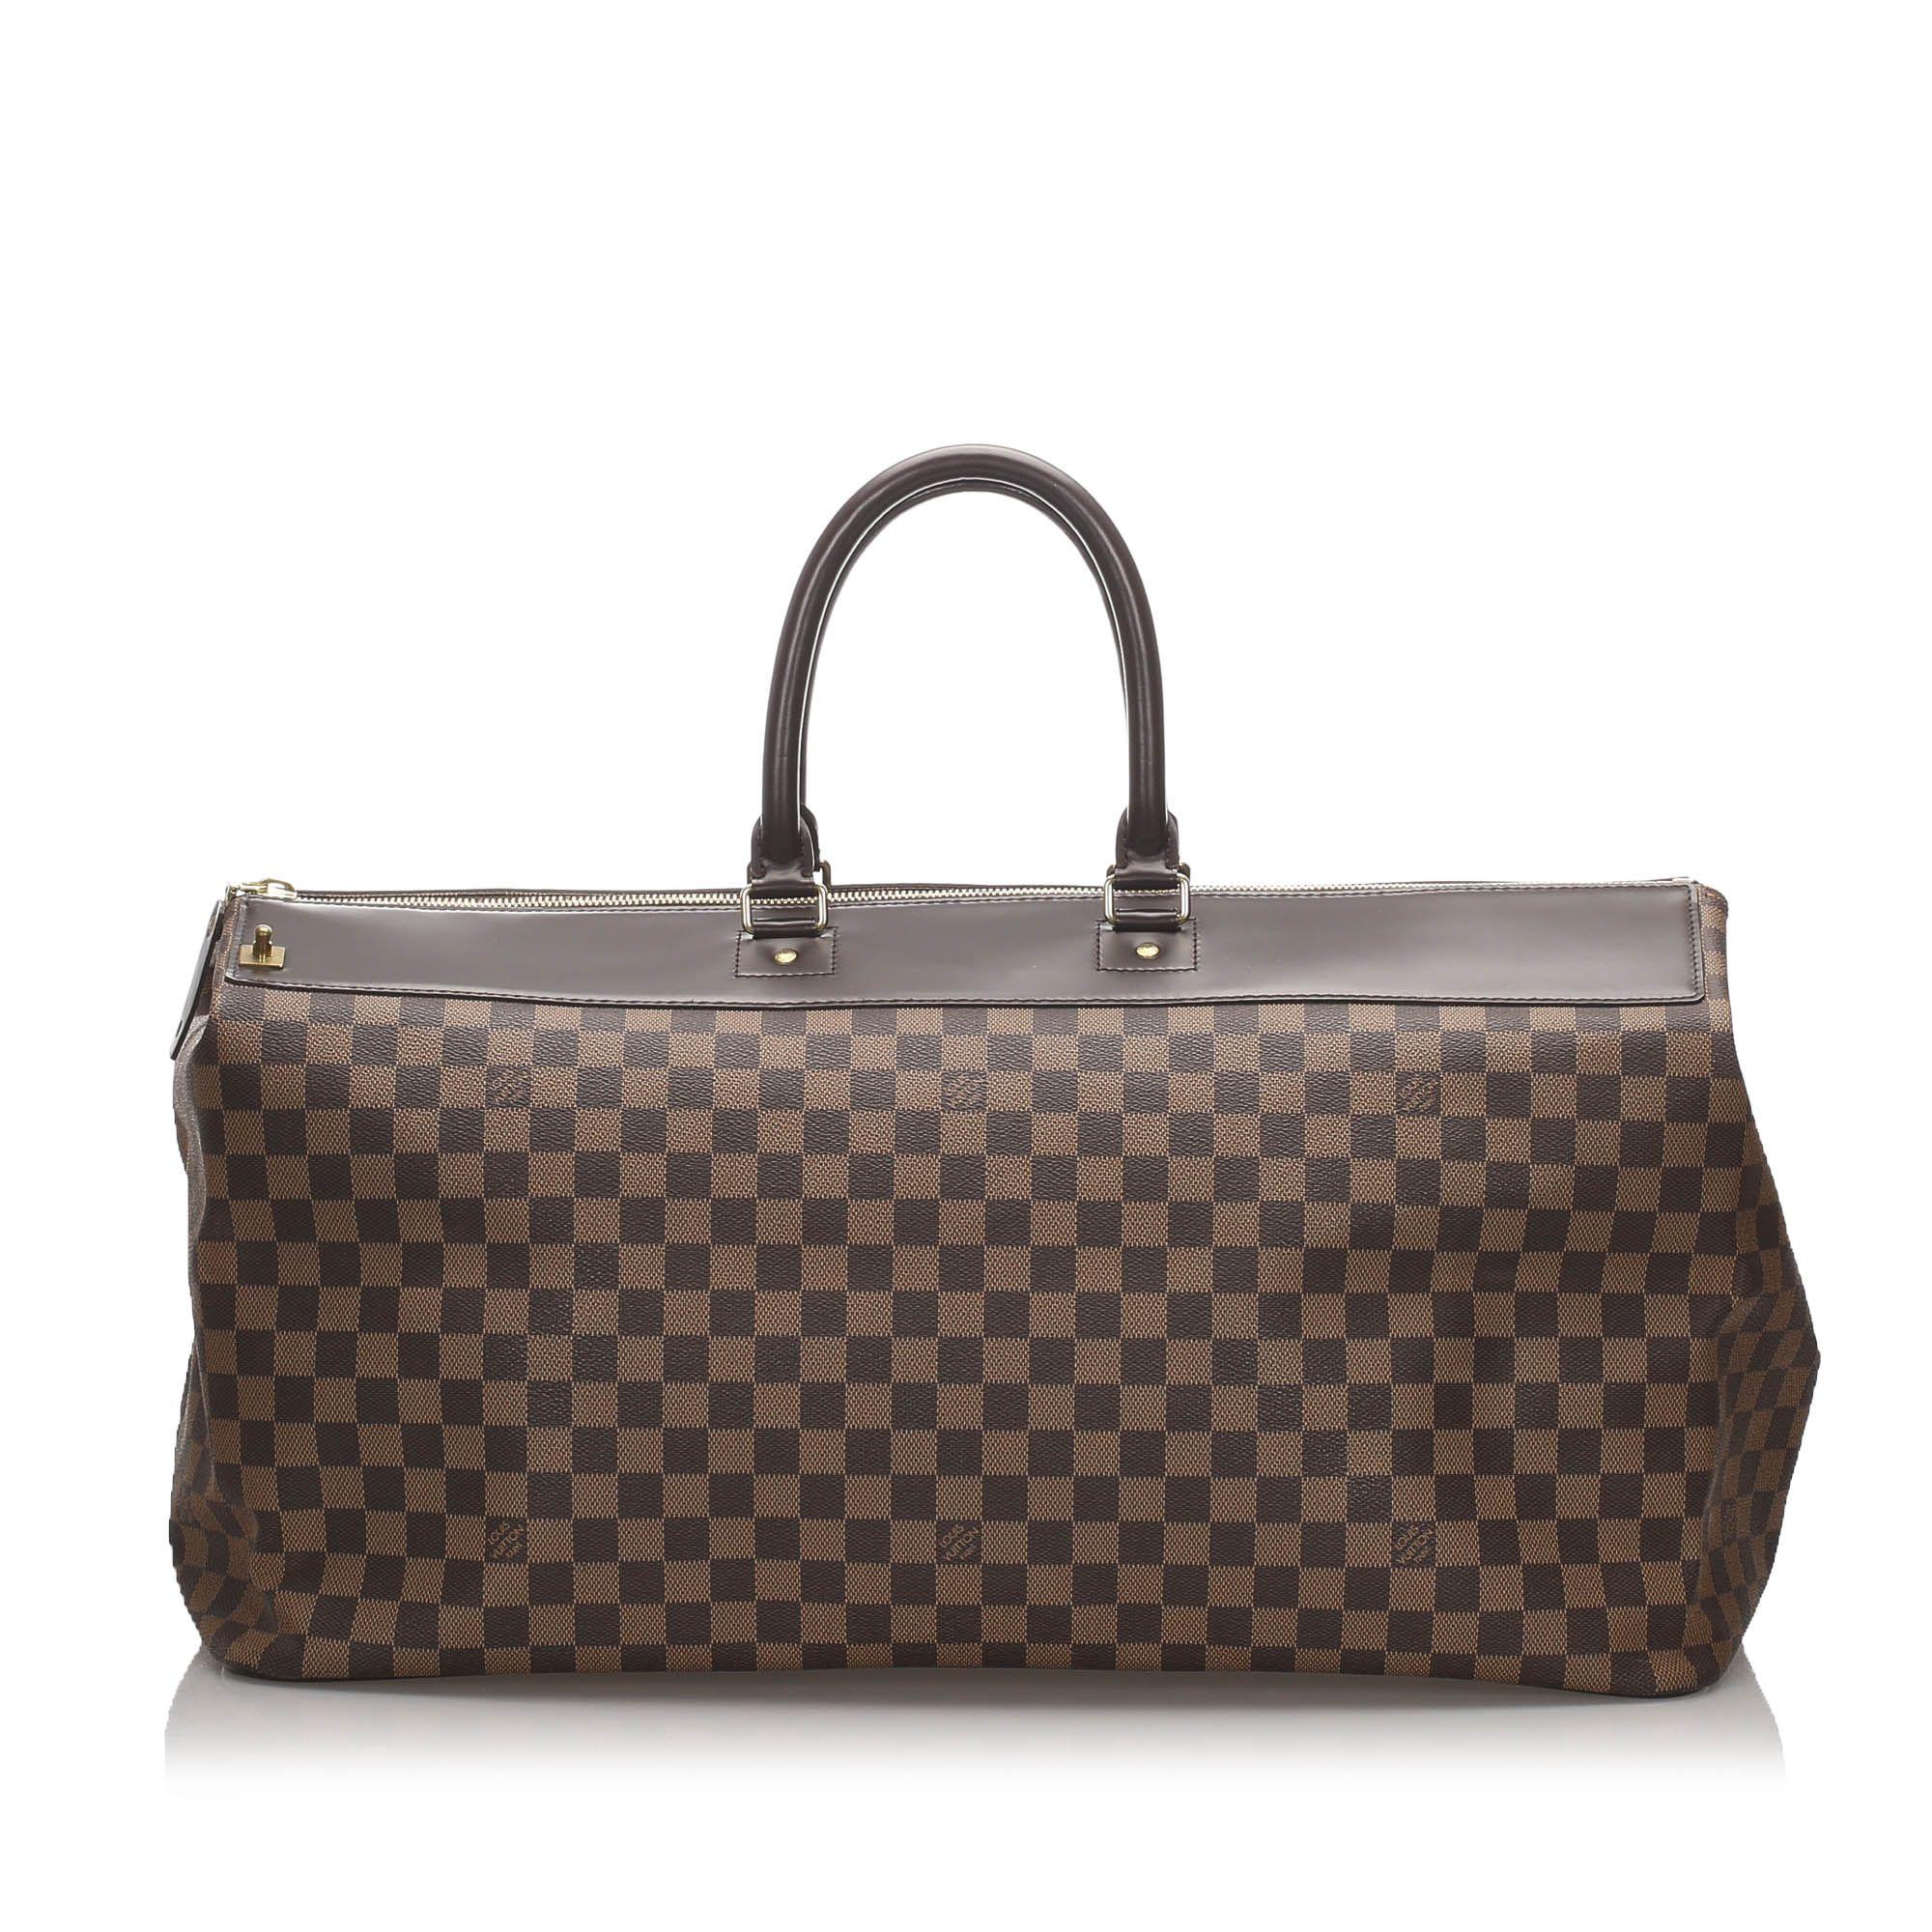 Vintage Louis Vuitton Damier Ebene Greenwich GM Brown